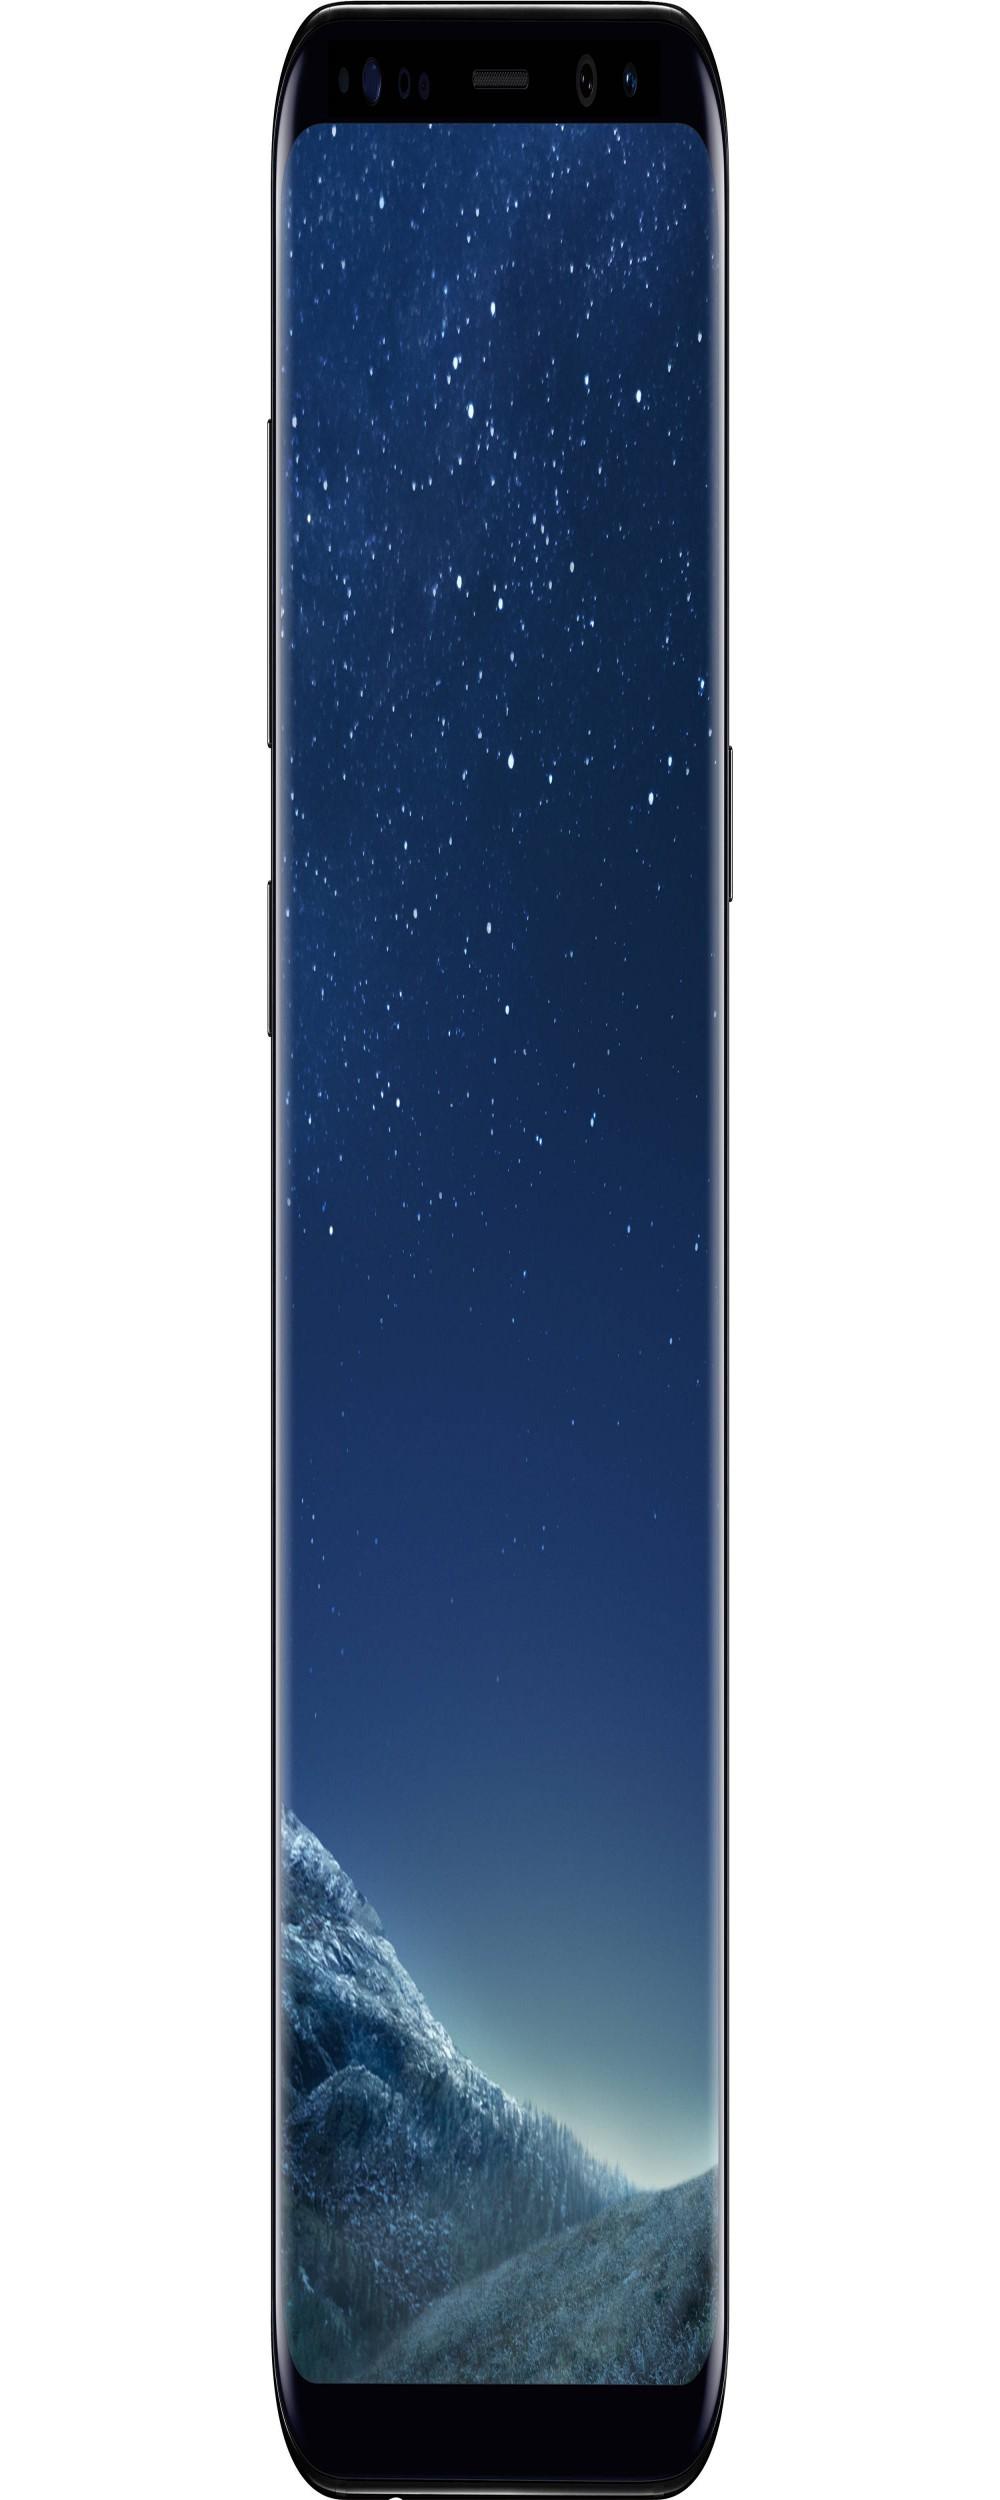 "Smartphone Samsung Galaxy S8+ SM-G955FD Dual SIM 64GB de 6.2"" 12MP/8MP OS 7.0 - Preto"